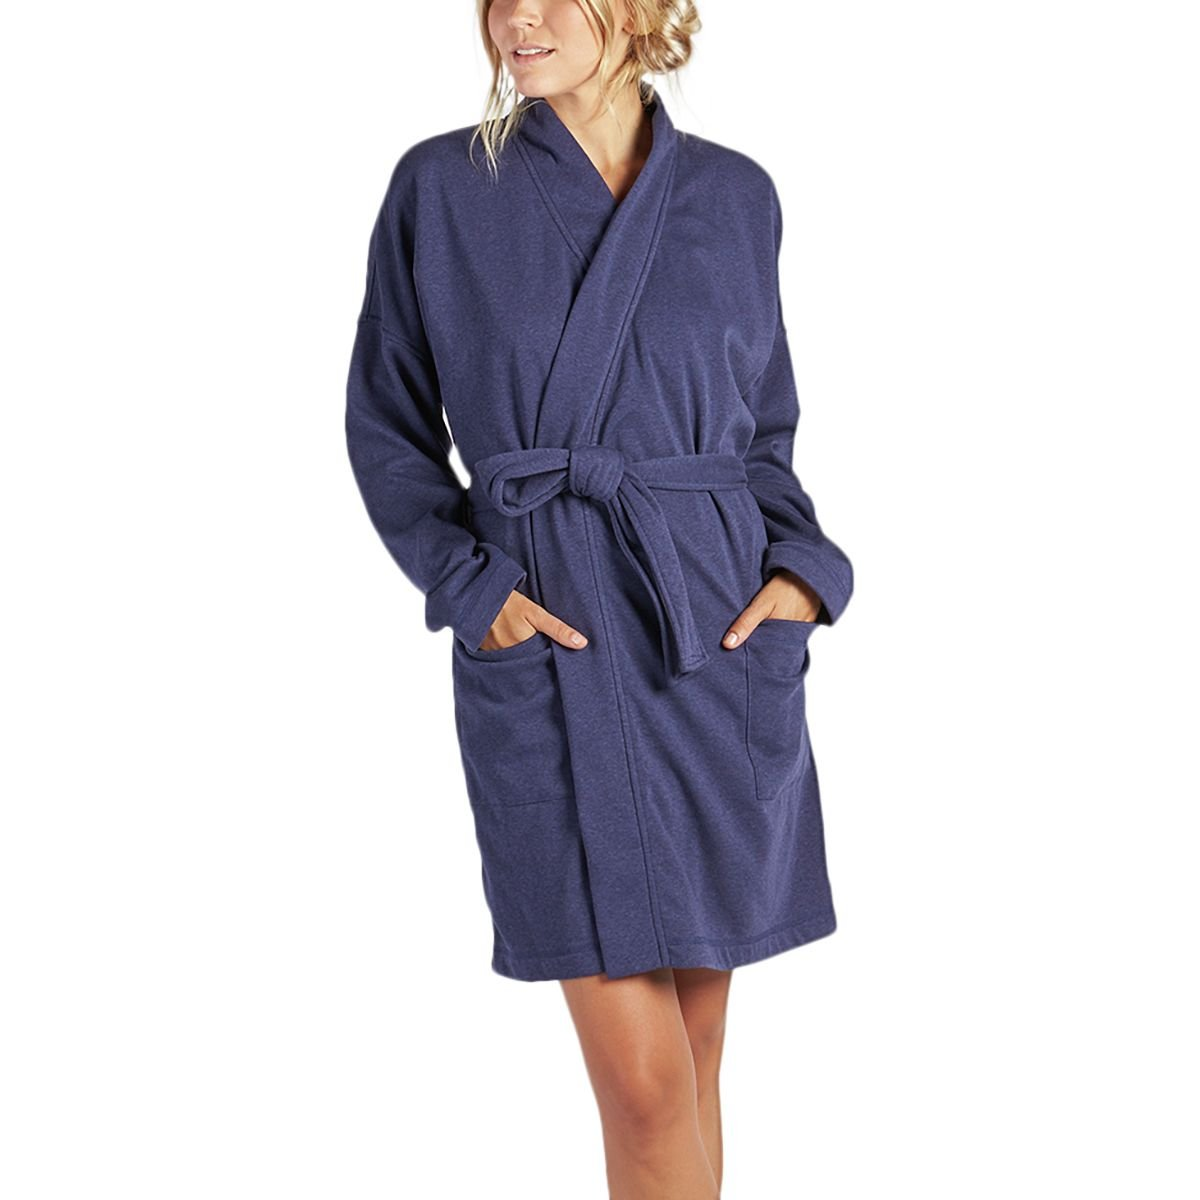 UGG SLEEPWEAR ユニセックスアダルト B01DCWLNC6 X-Large|Dark Pajama Blue Dark Pajama Blue X-Large